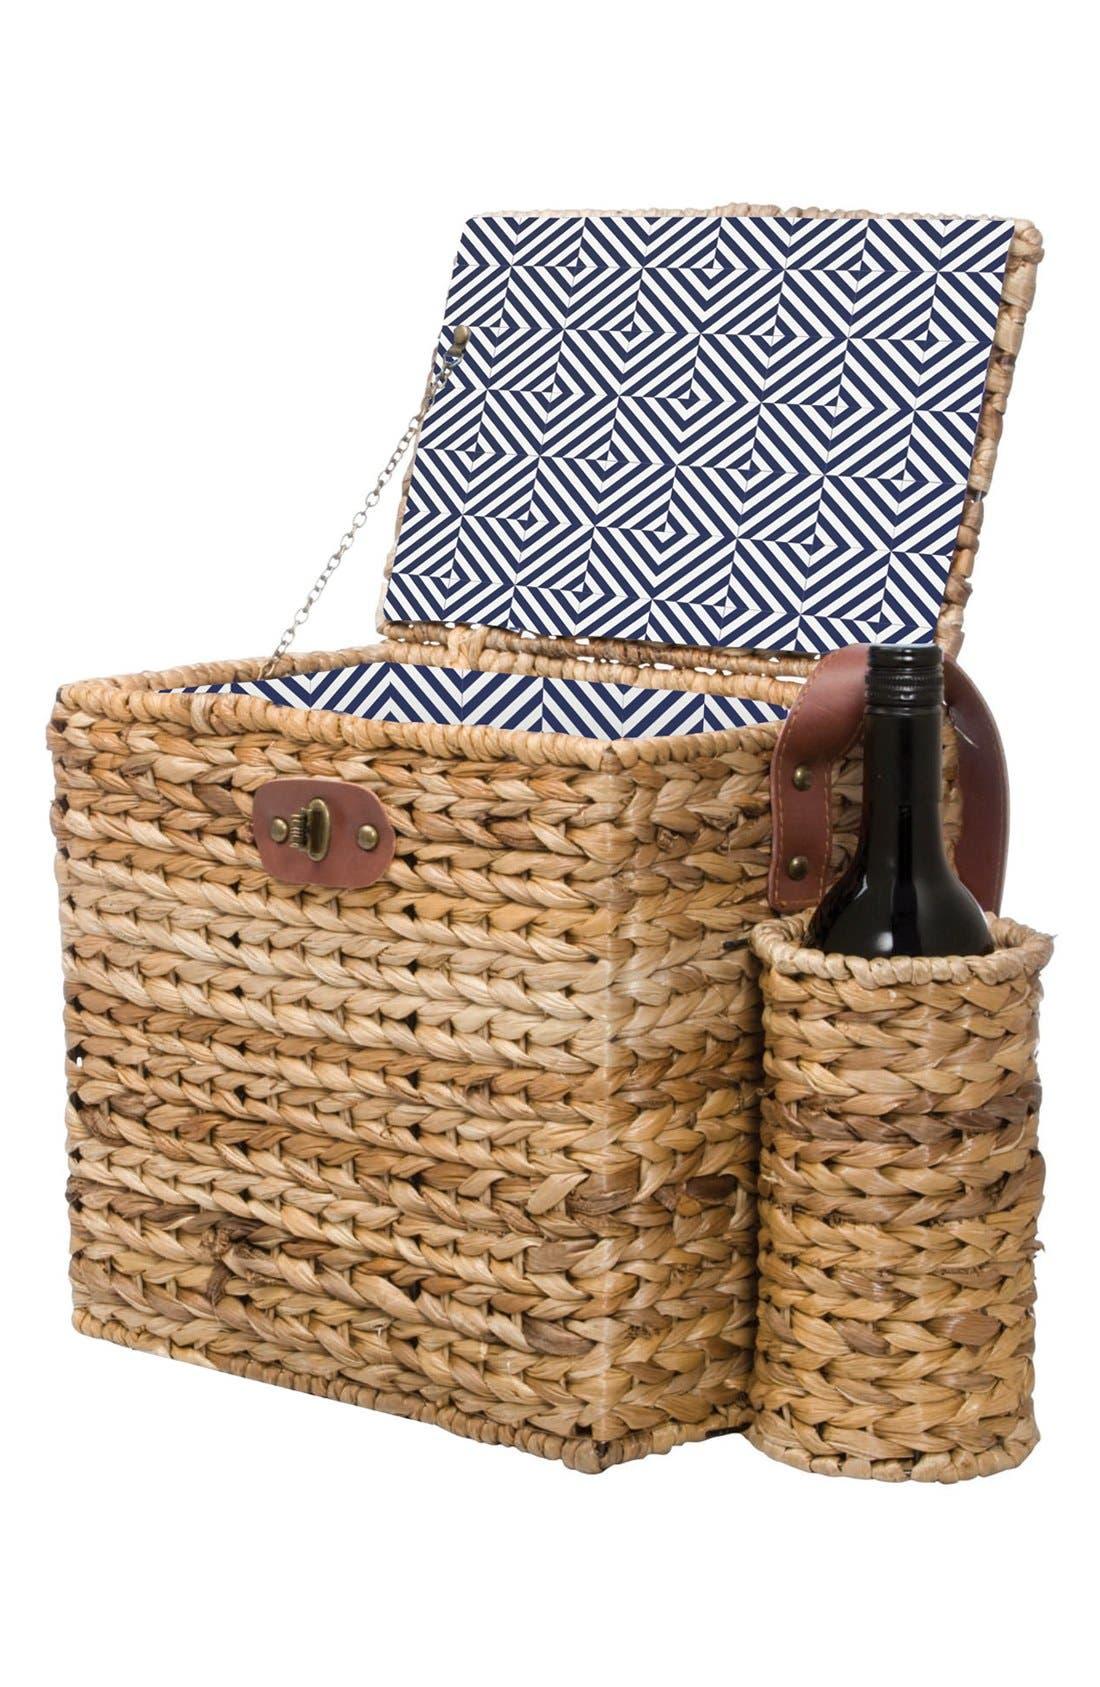 Wicker Picnic Basket,                             Main thumbnail 1, color,                             200